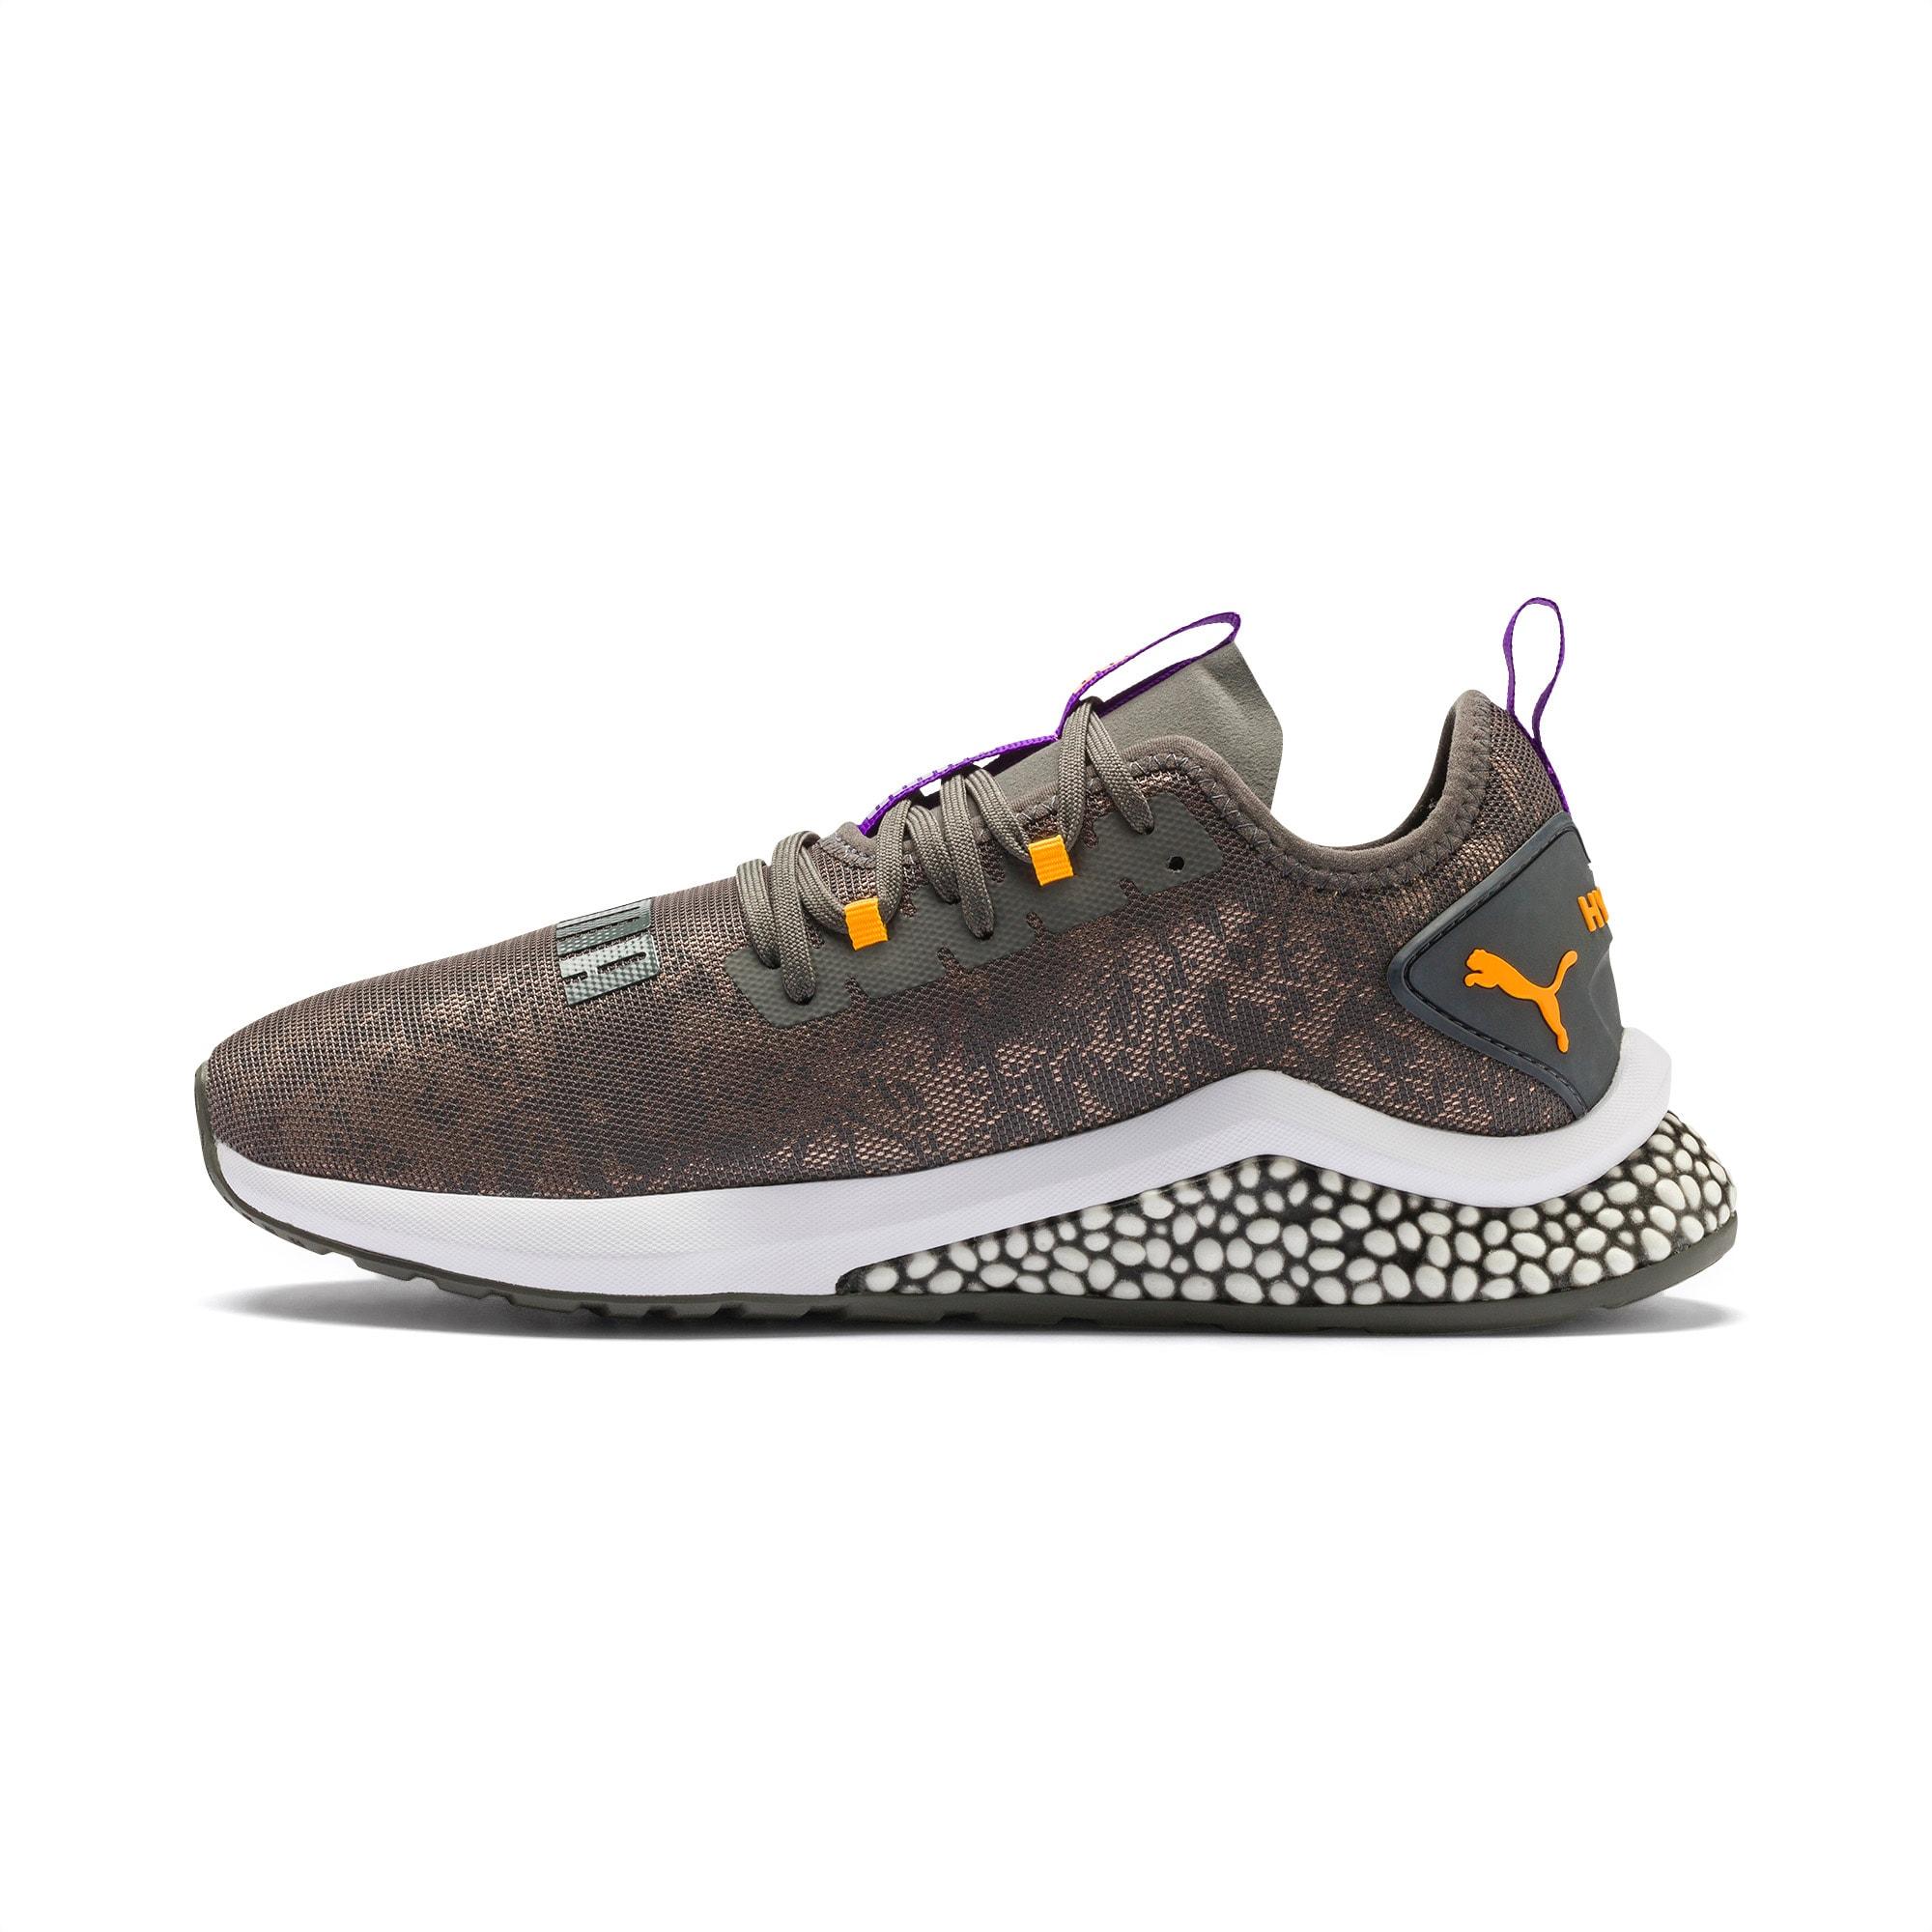 HYBRID NX Rave Men's Running Shoes